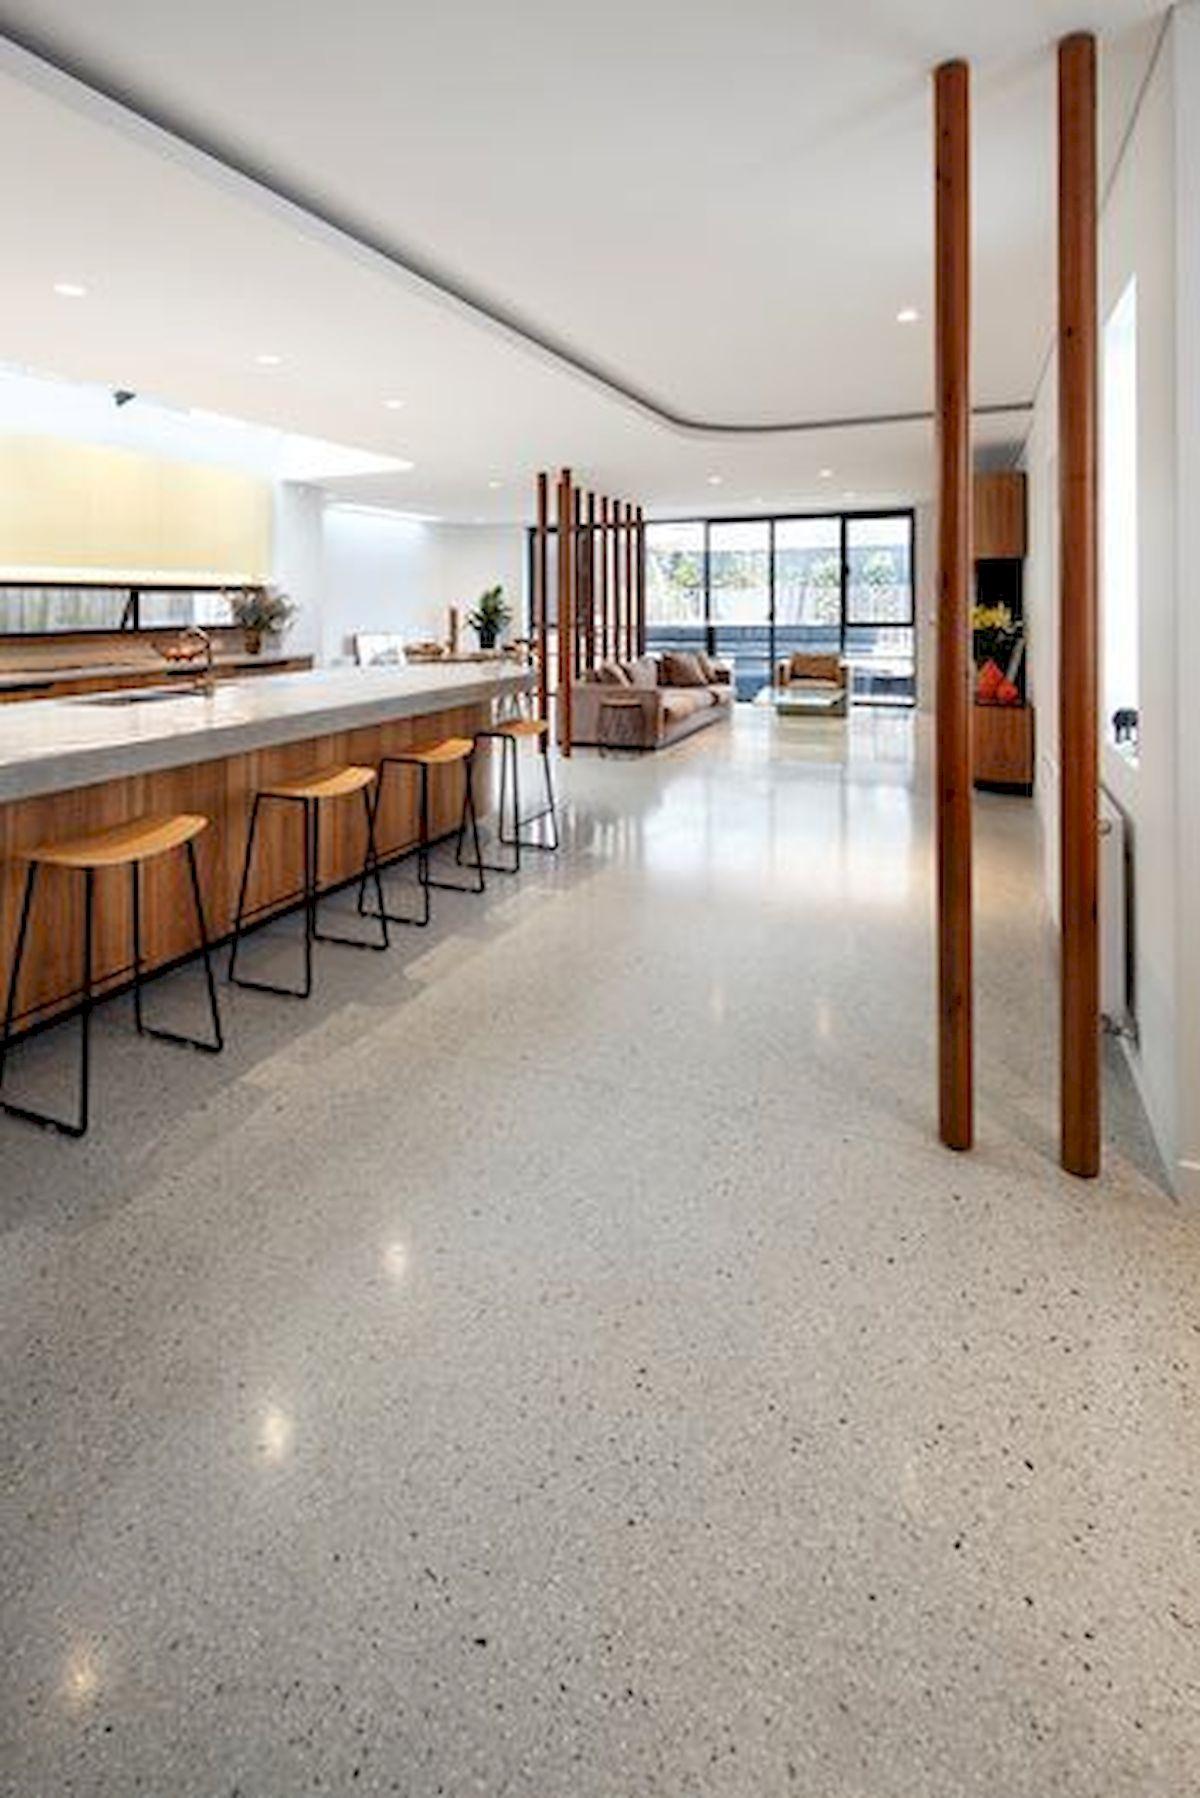 70 Smooth Concrete Floor Ideas for Interior Home 20 ...